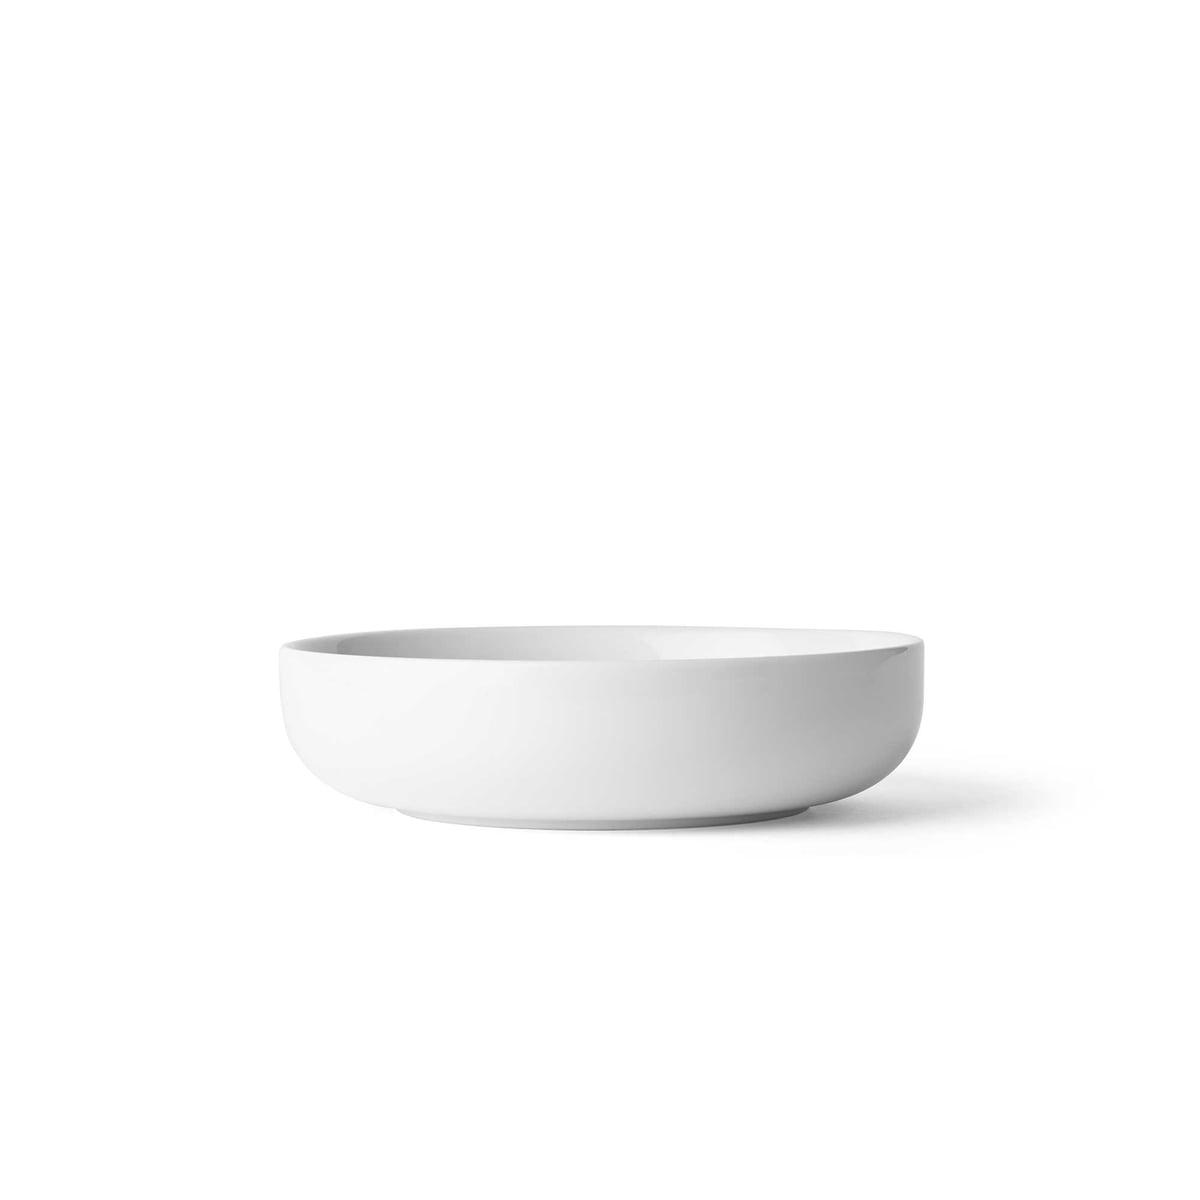 Menu - New Norm Schale Ø 13,5 cm, low, weiß